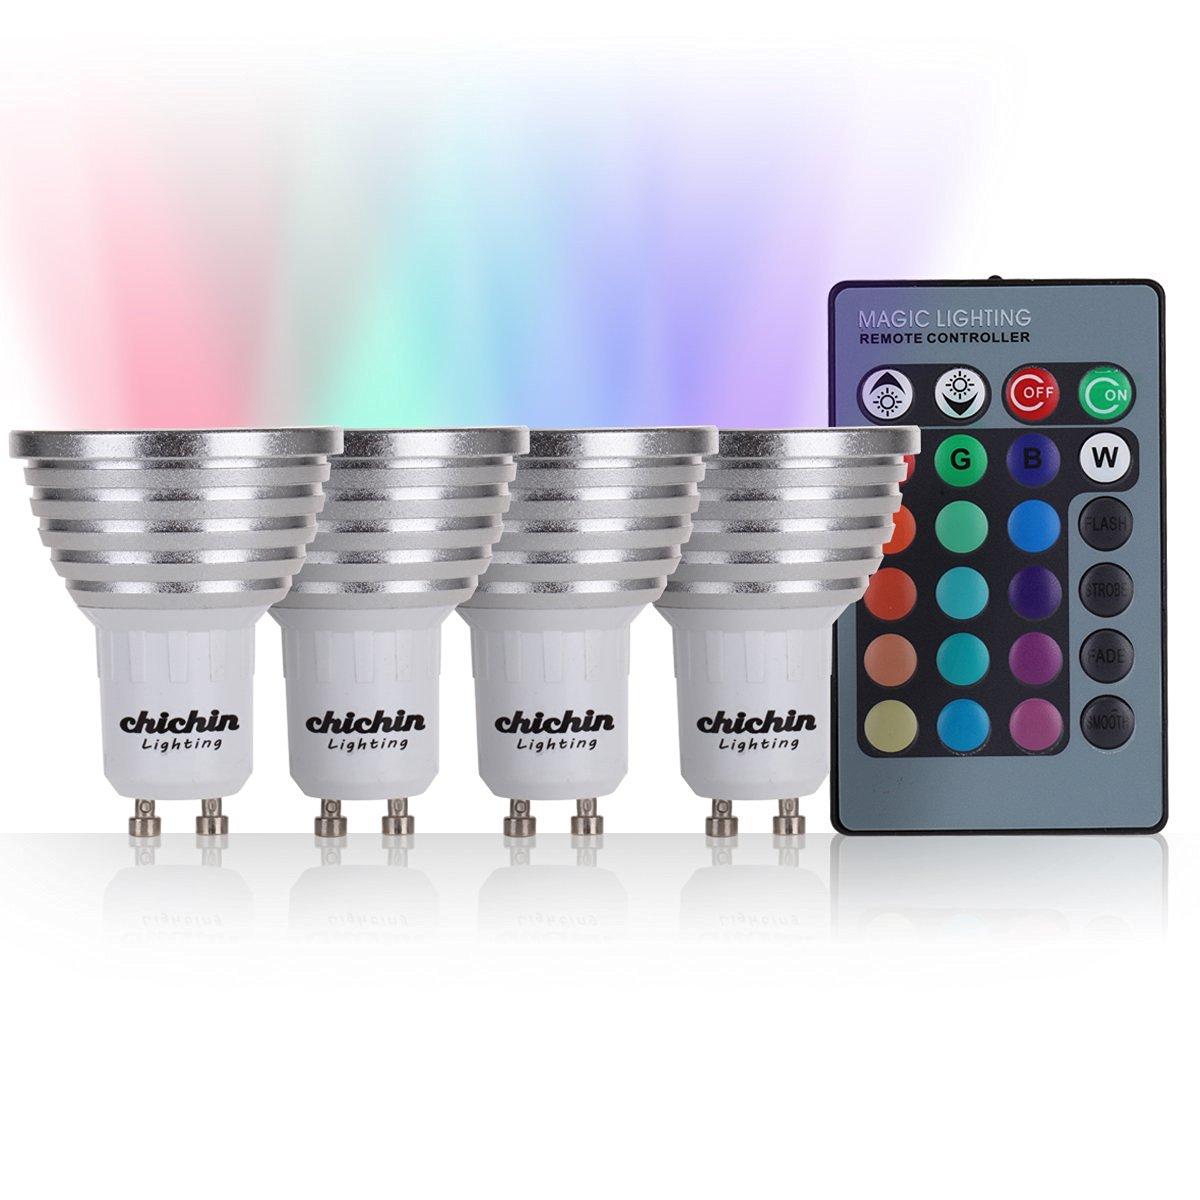 ChiChinLighting RGB LED Bulb RGB Gu10 RGB Spotlight pack of 4 pieces controlled by one wireless controller, Color Changing led Lights and Color changing Gu10, moody led bulbs RBG led bulb